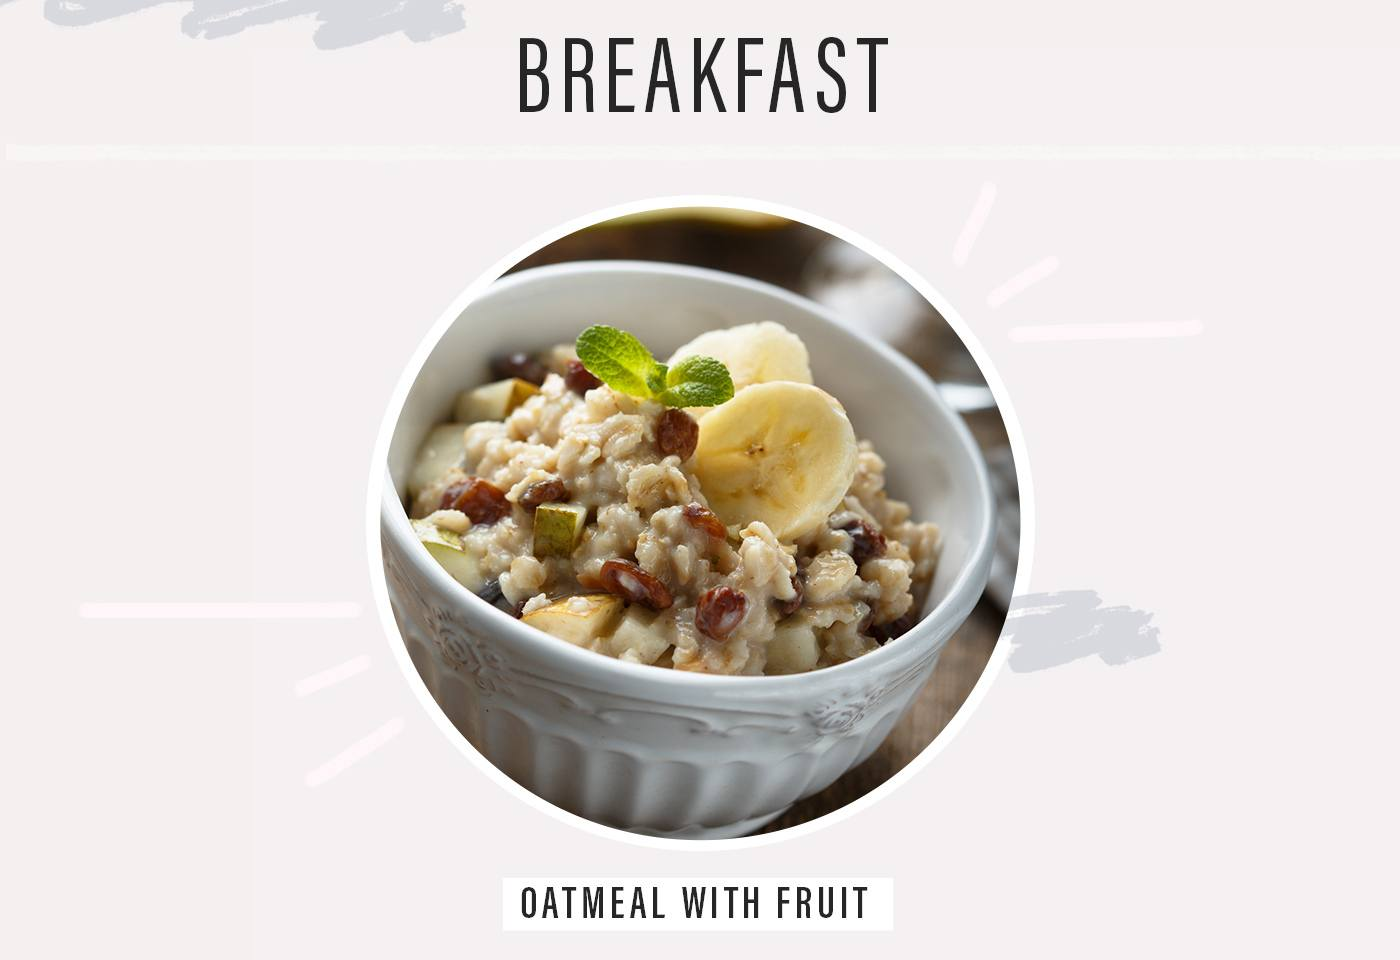 slt instructor amy paulin's oatmeal breakfast